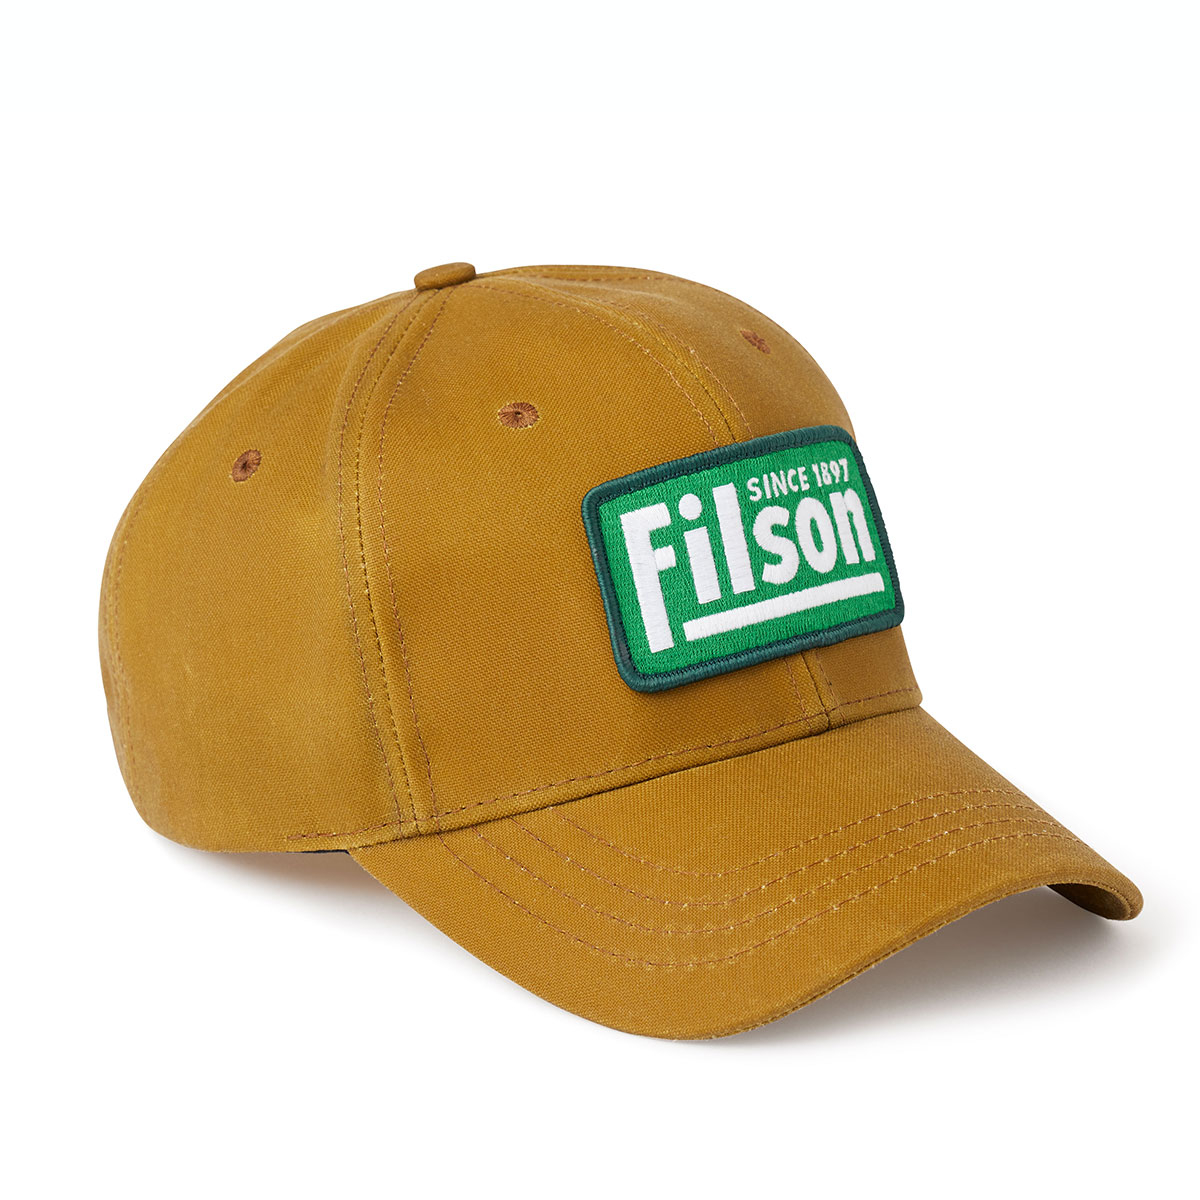 Filson Oil Tin Logger Cap Tan, klassieke pet die beschermt tegen de elementen